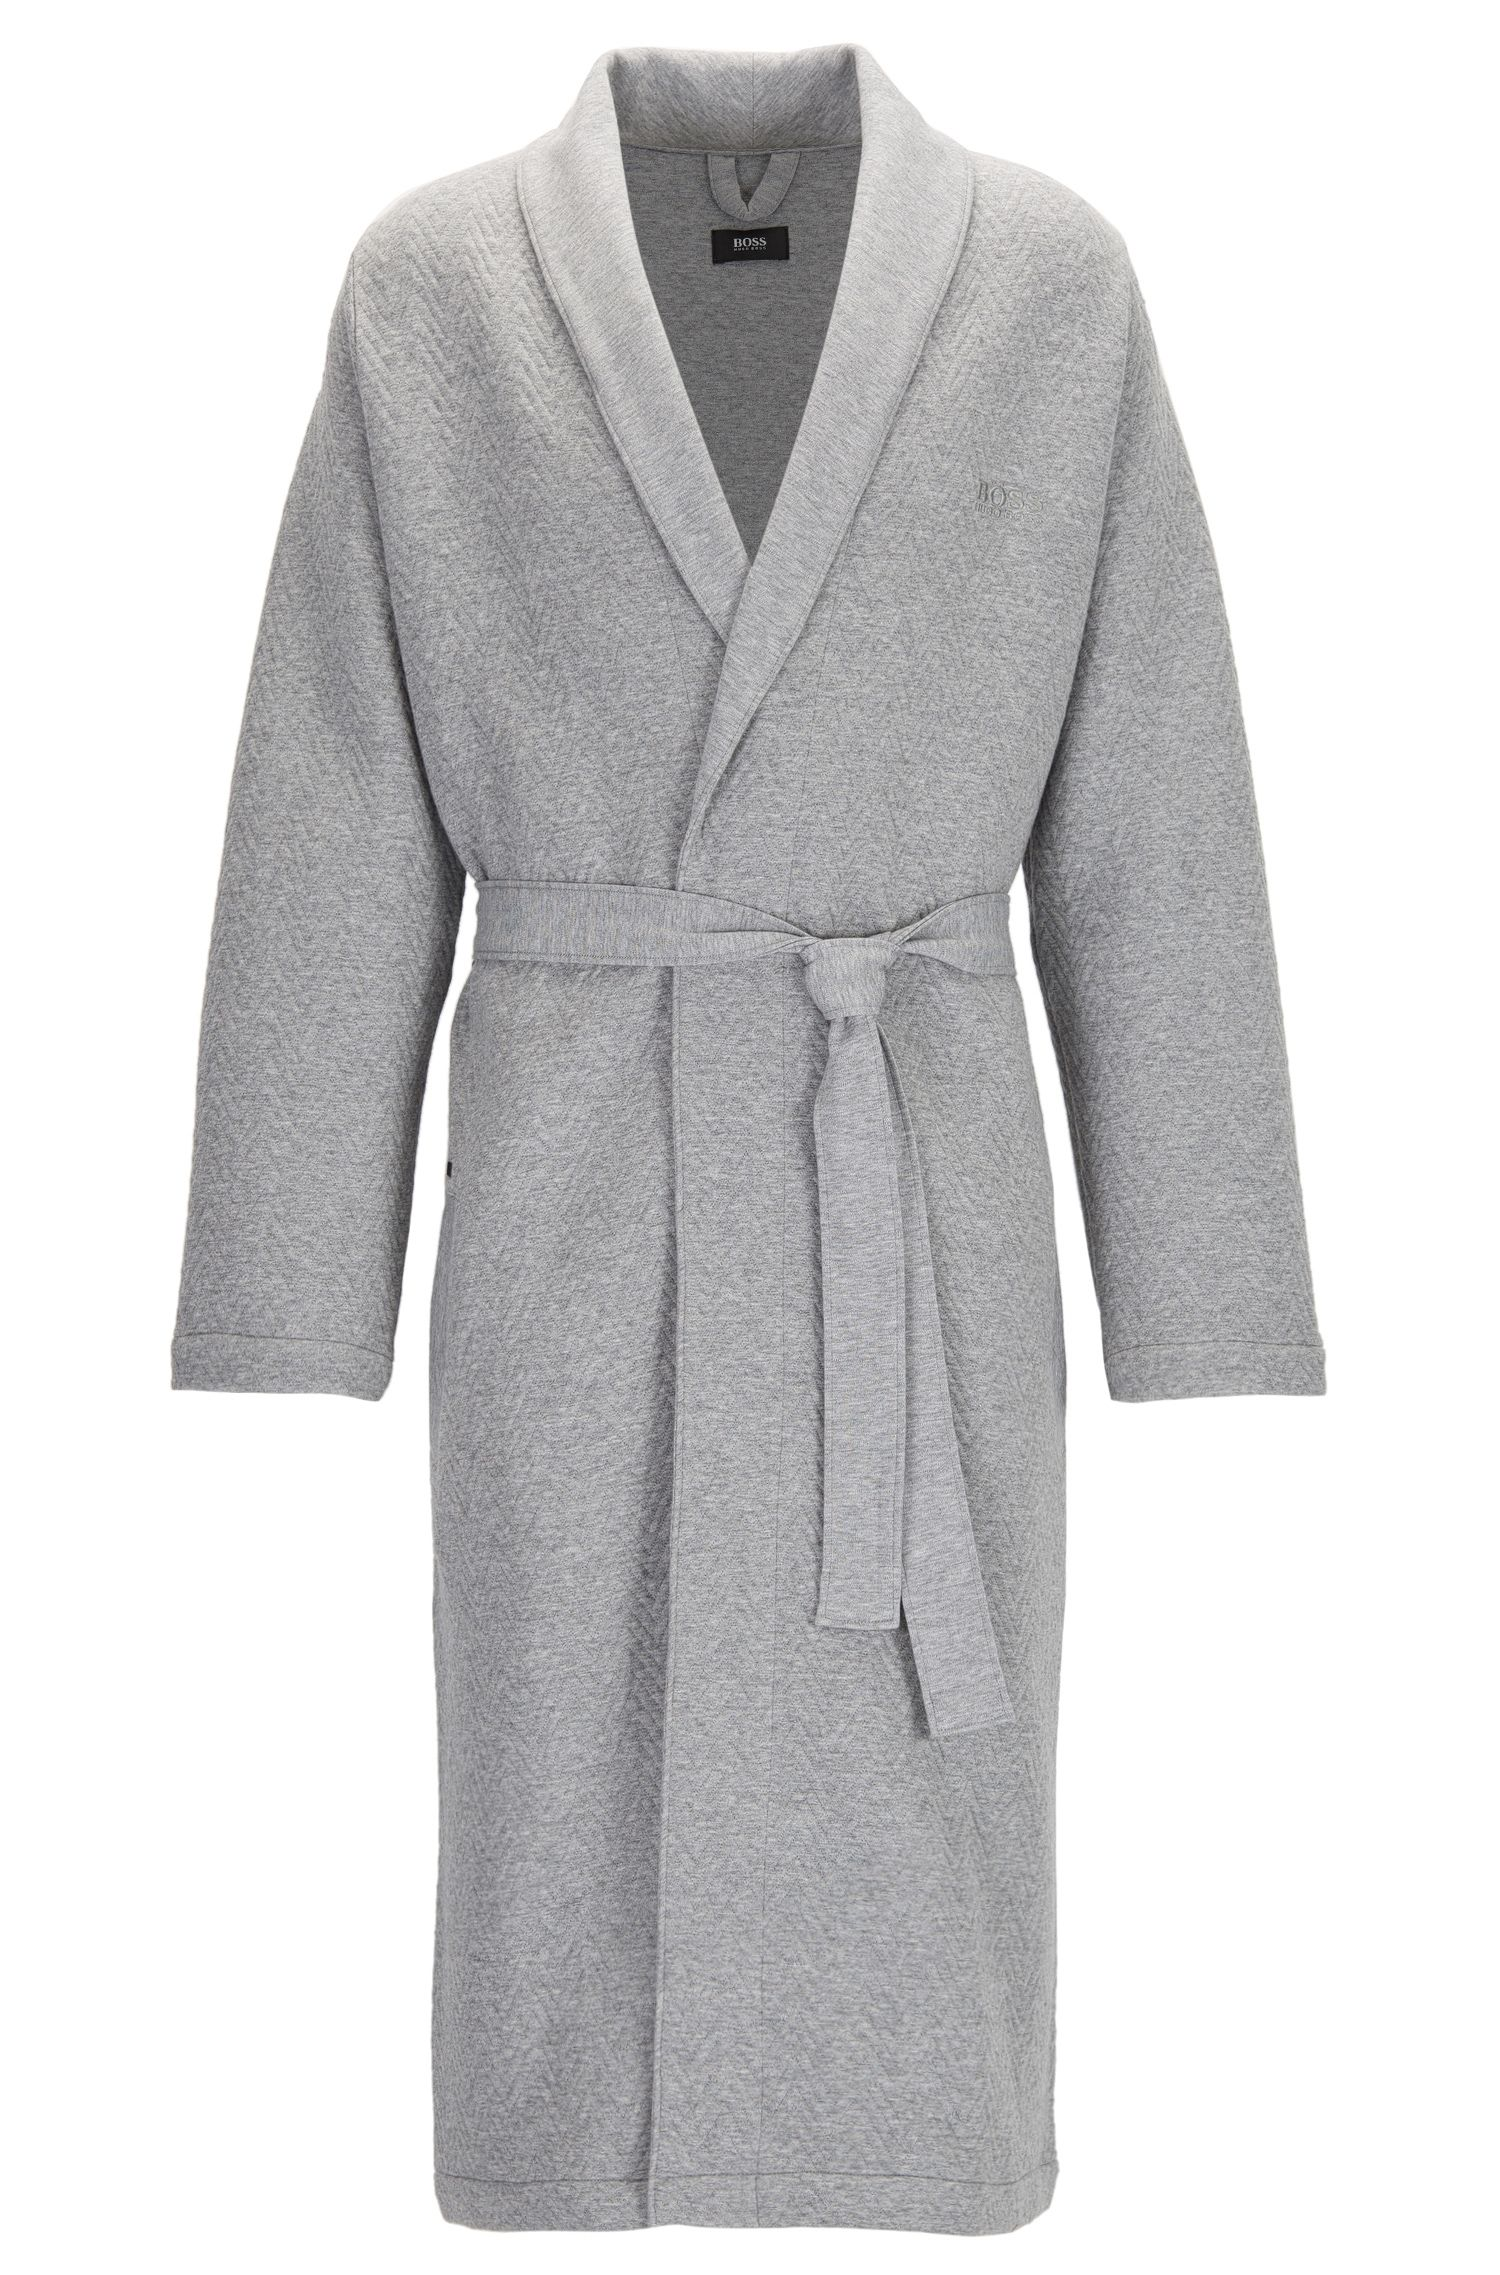 Herringbone-Knit Cotton Robe | Contemporary Robe